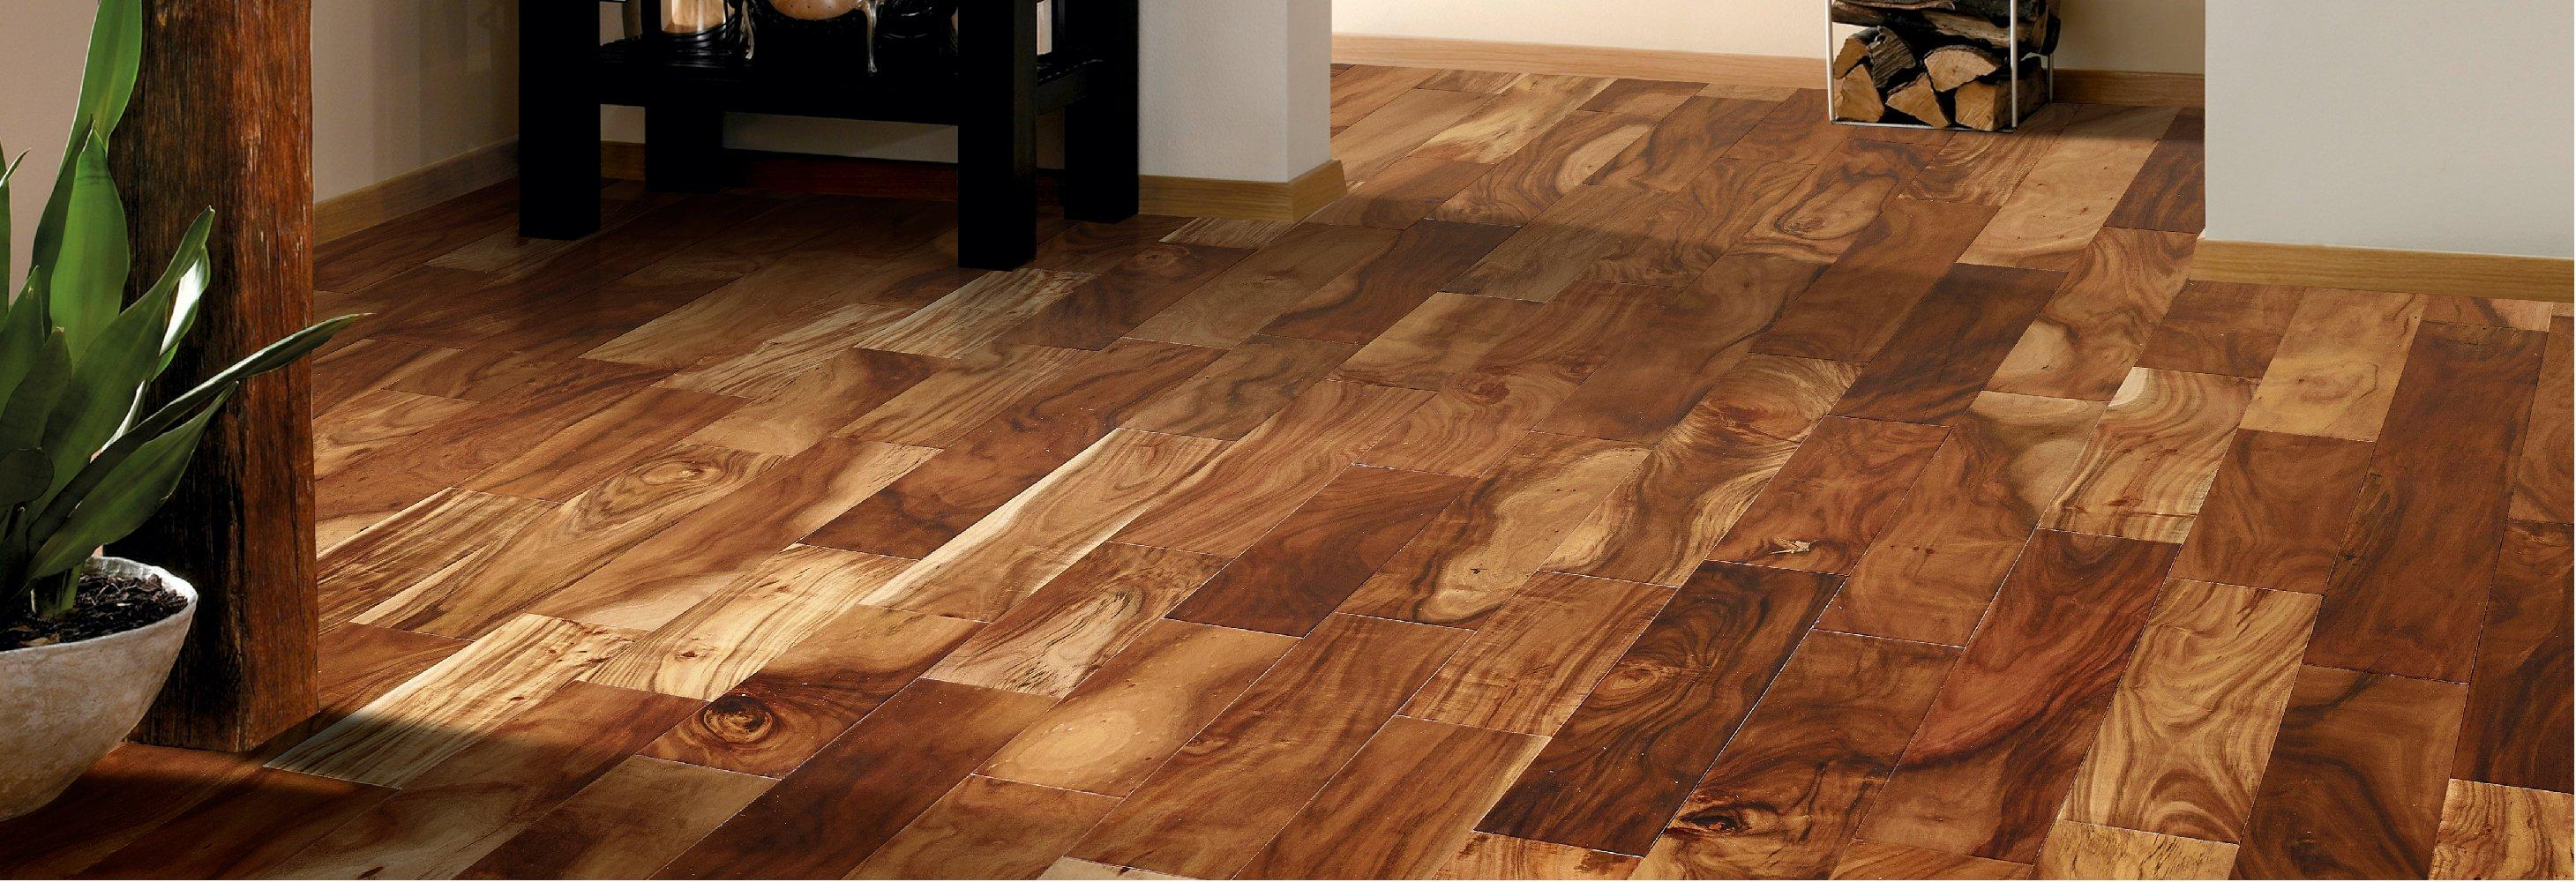 engineered oak flooring engineered hardwood flooring LADGGAZ